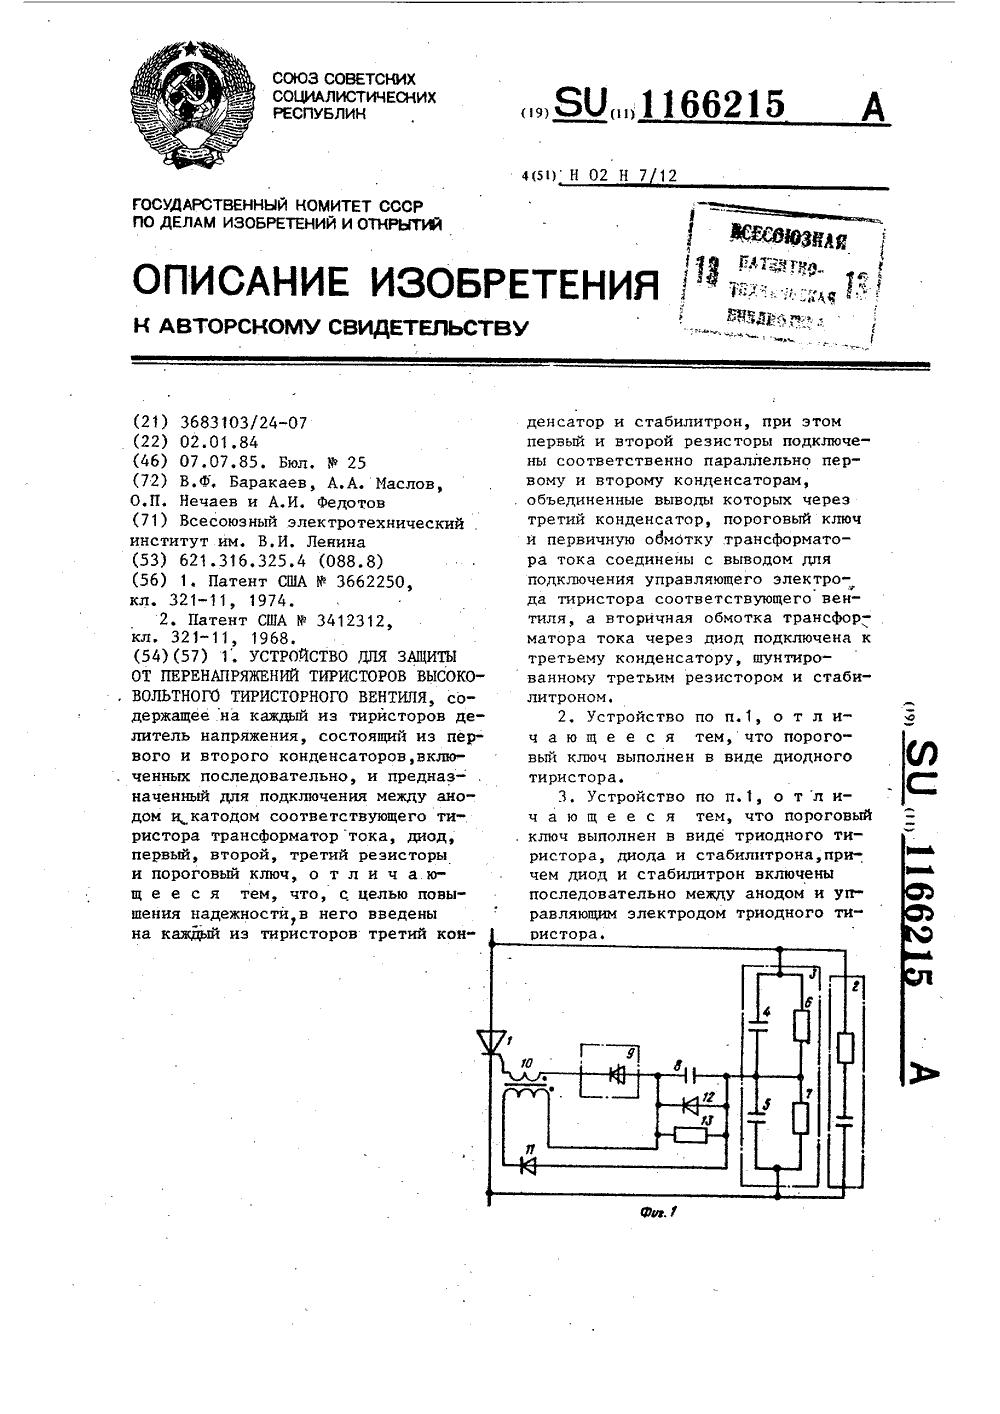 схема защита от перенапряжения 13,8в на тиристоре